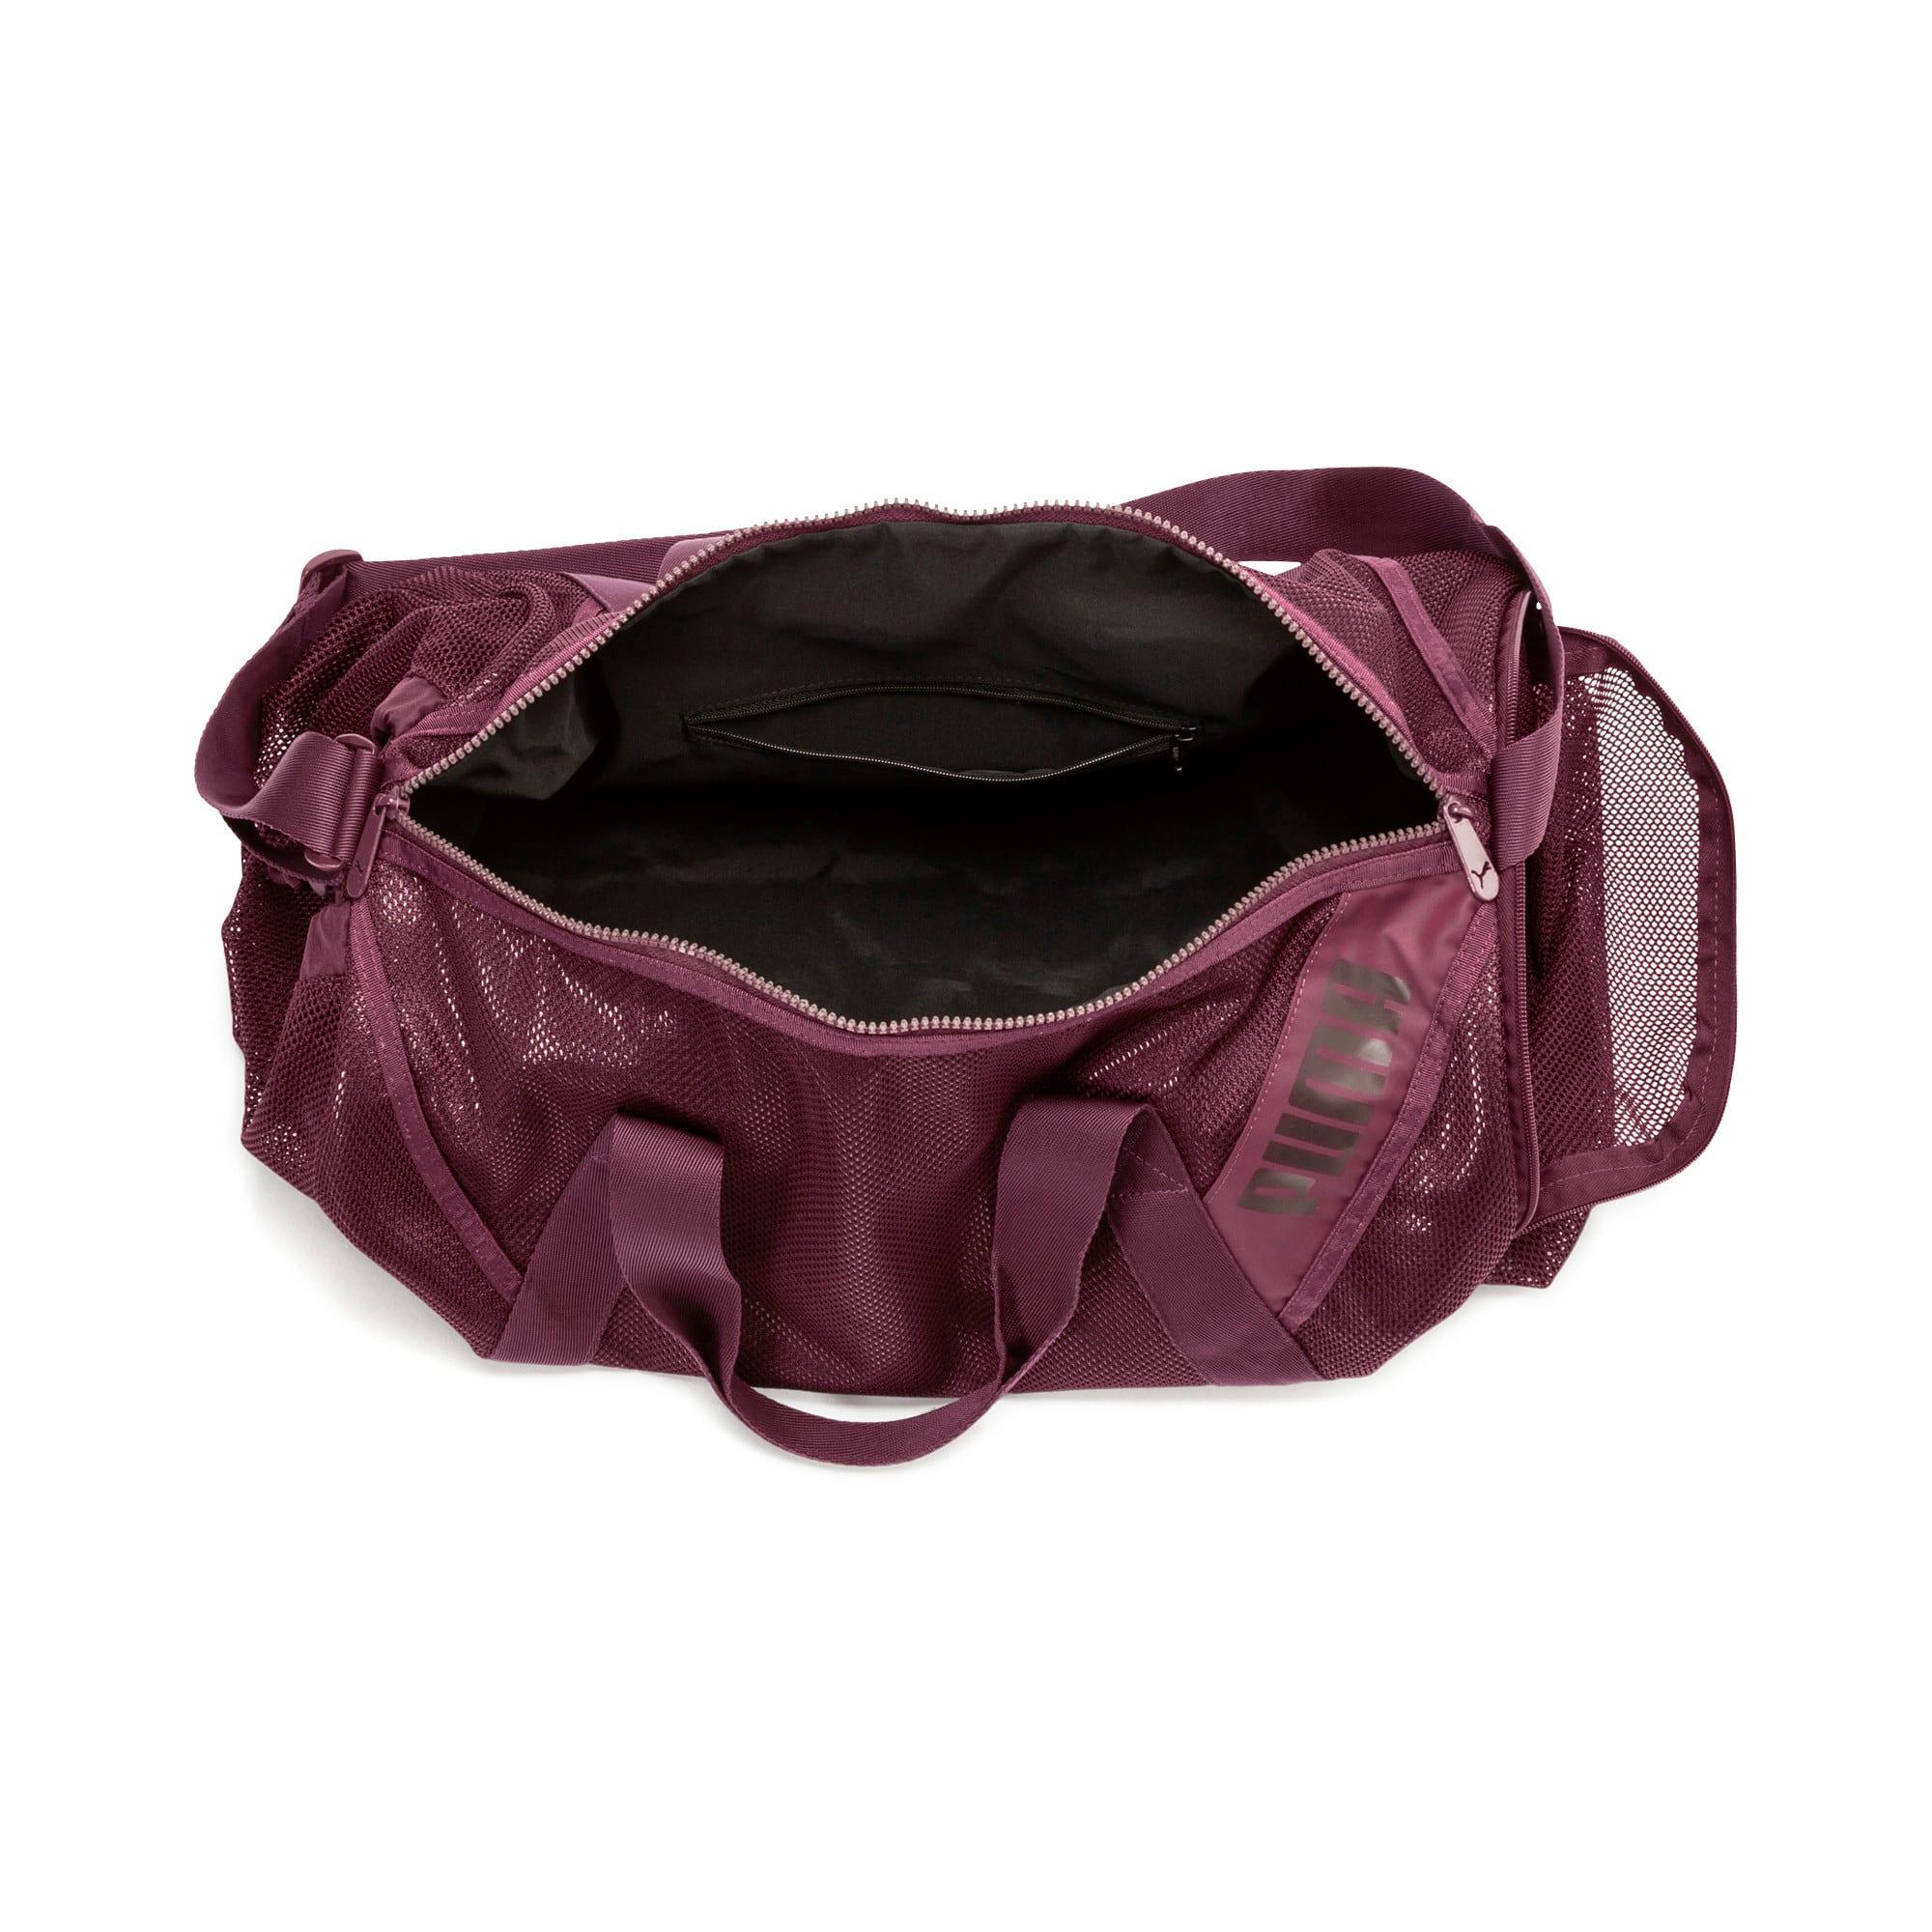 Thumbnail 3 of Ambition Women's Barrel Bag, Fig-Bronze-metallic, medium